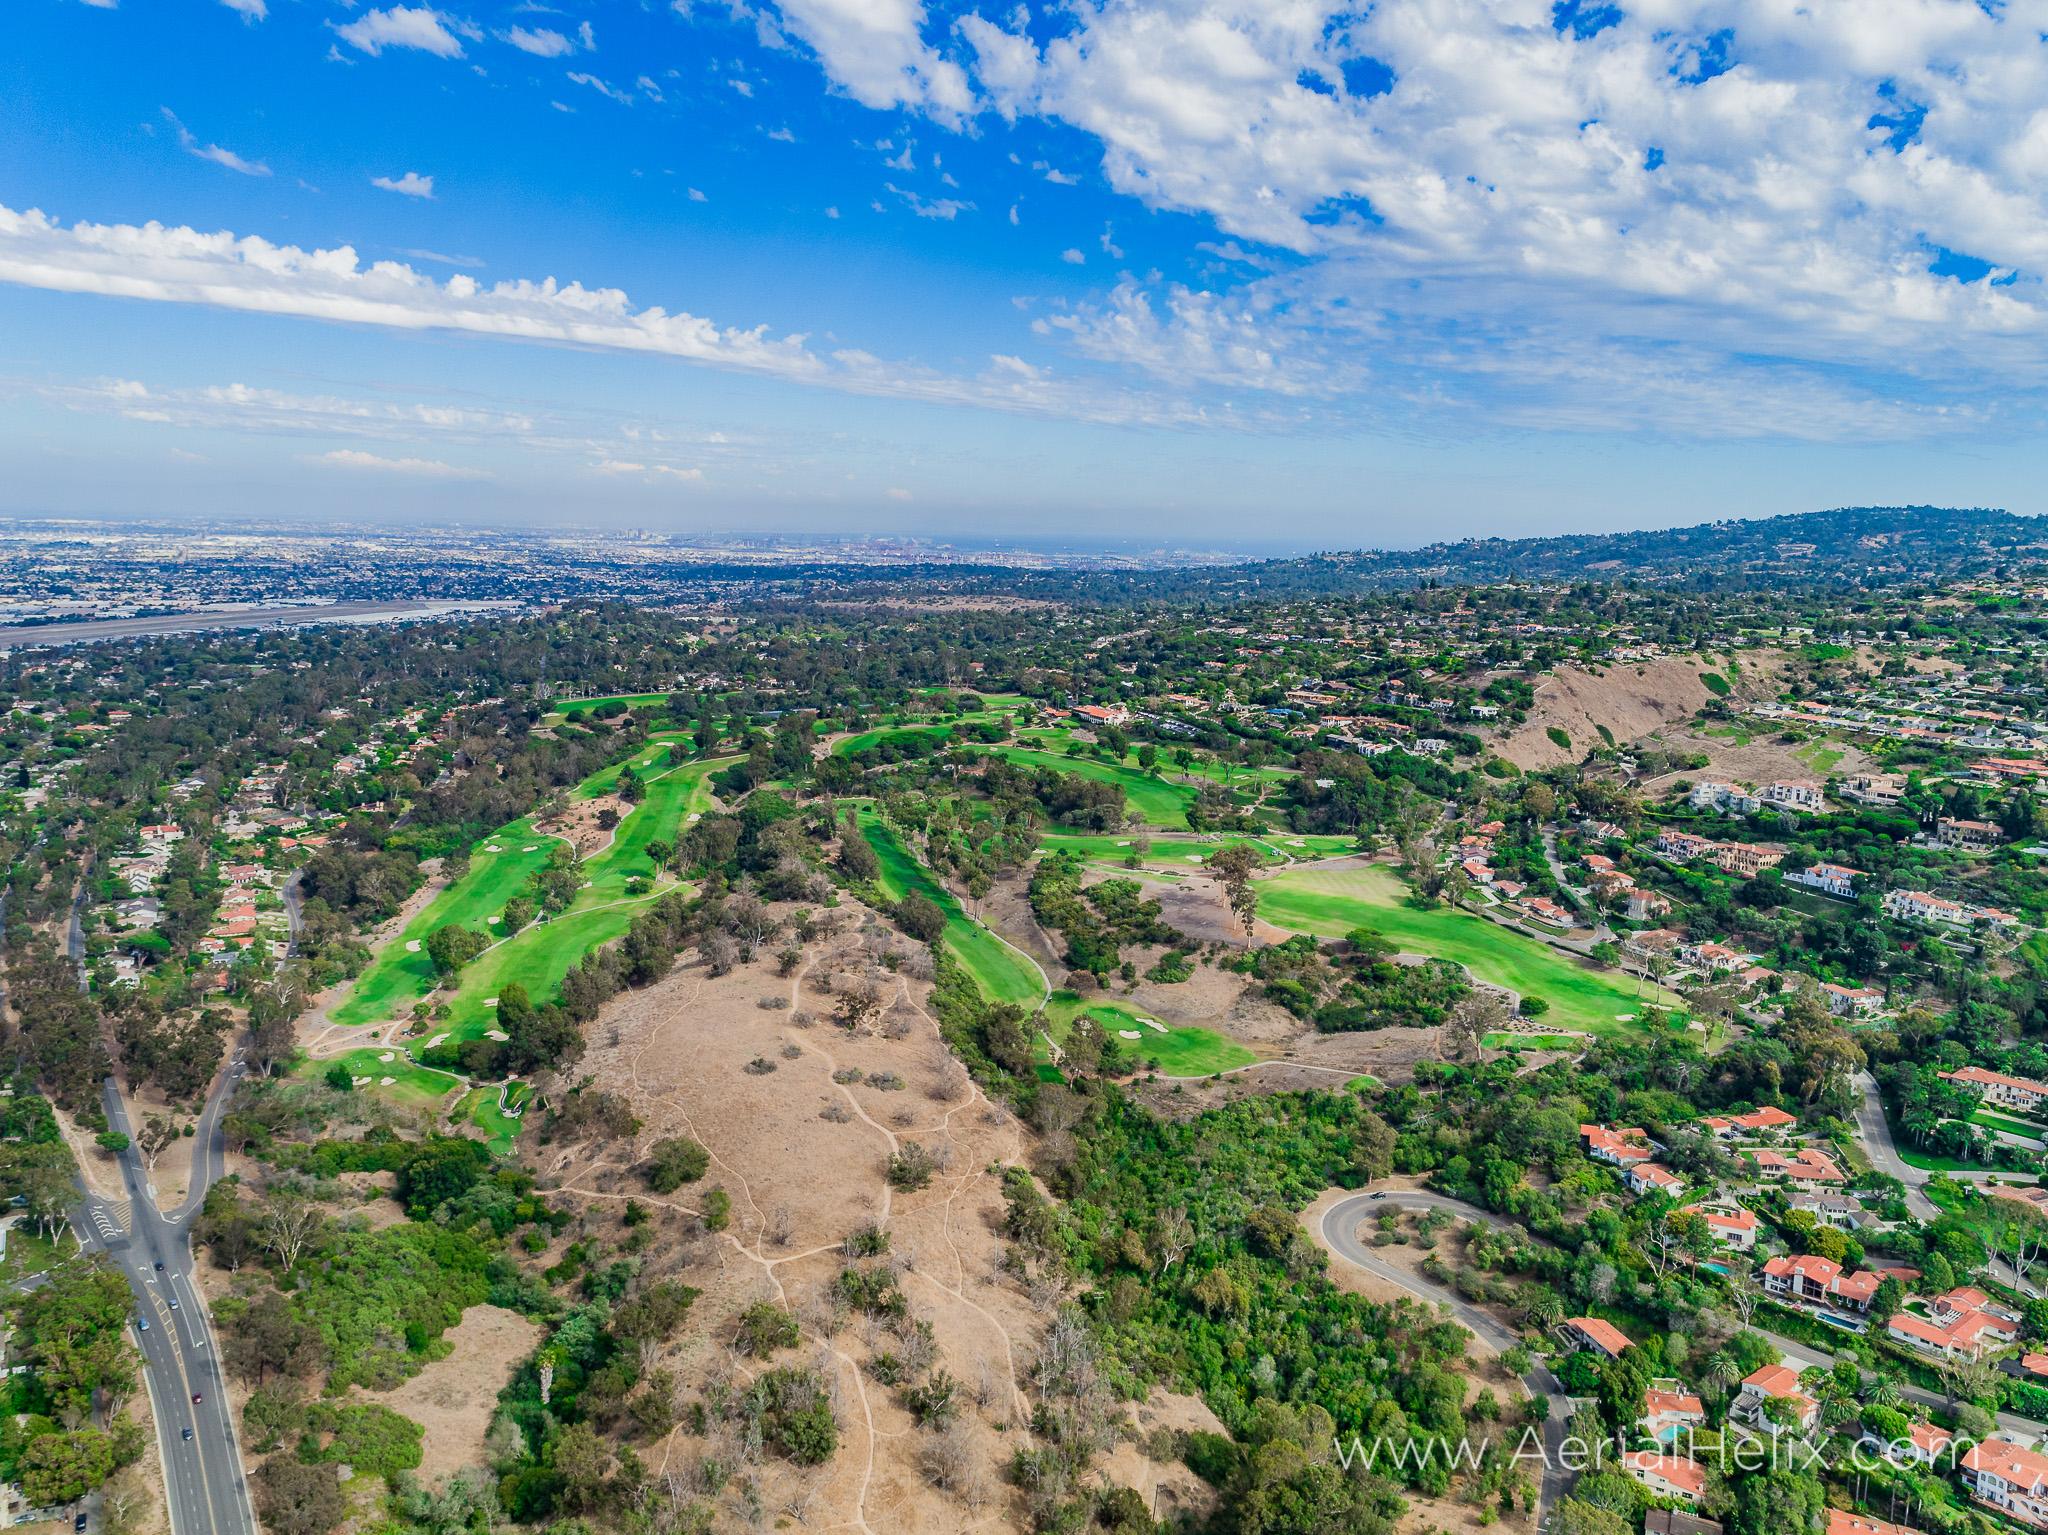 Woodfern Drive - HELIX Real Estate Aerial Photographer-40.jpg